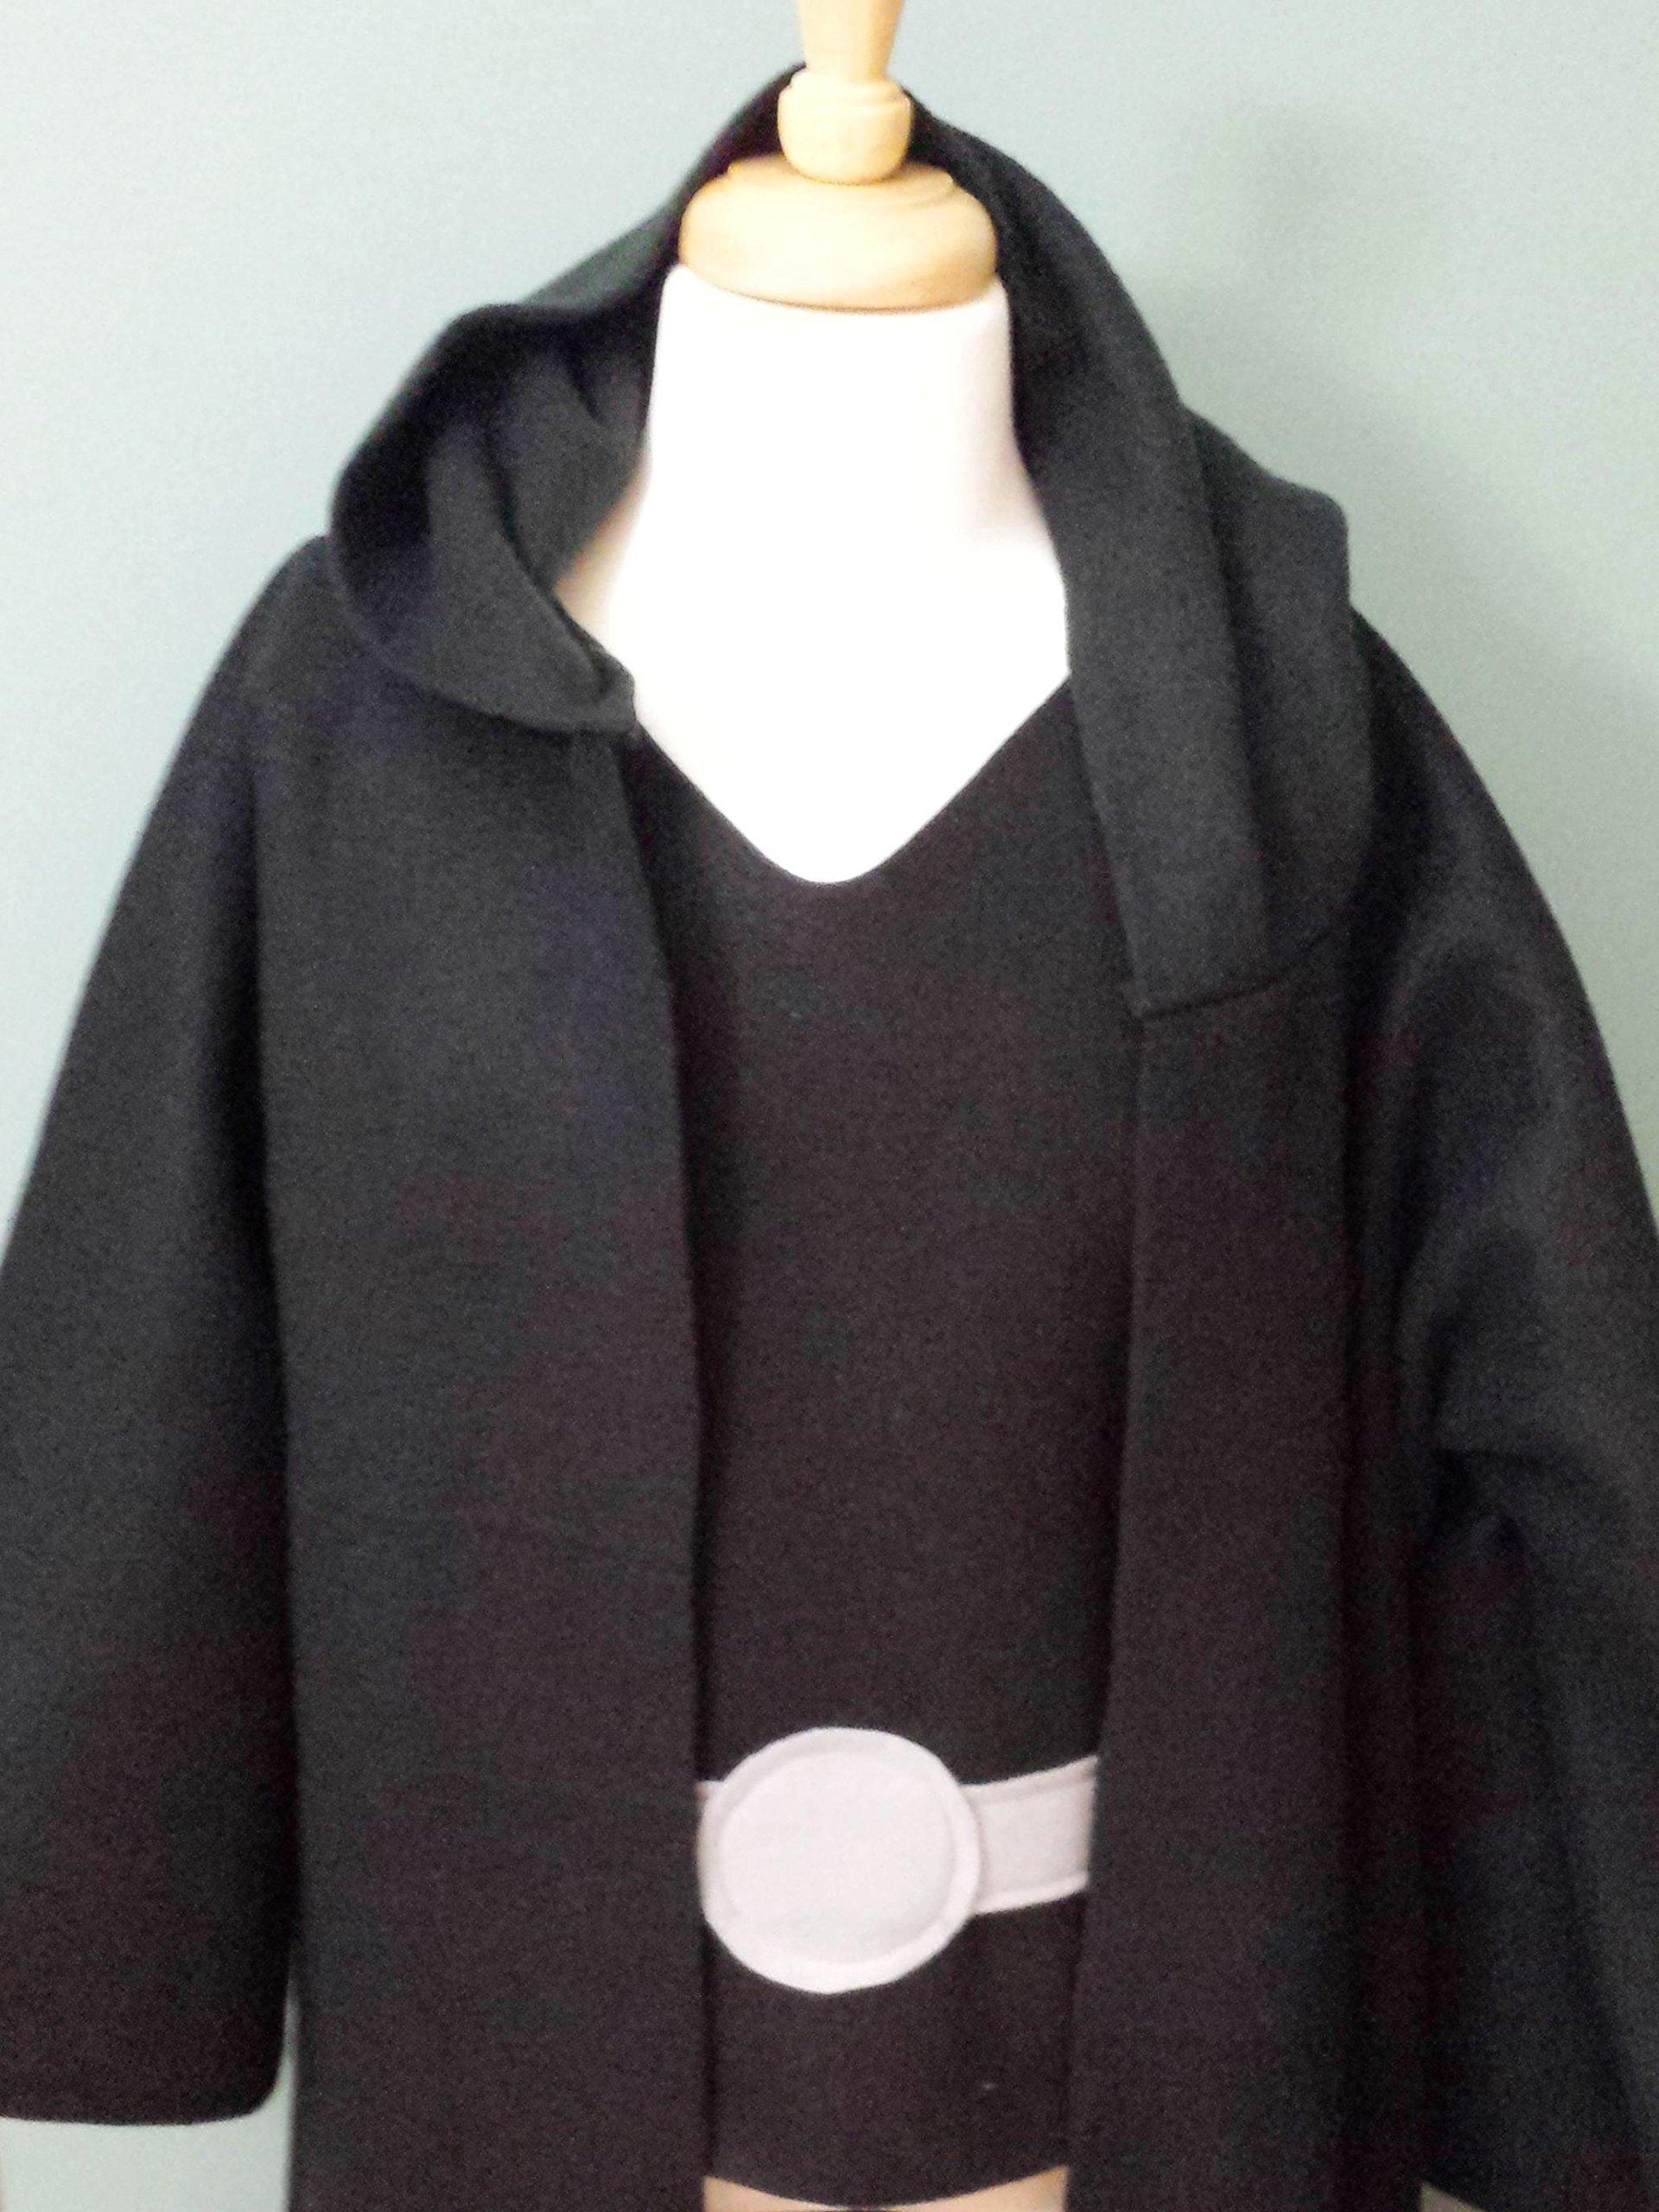 Kids Star Wars Sith Jedi Robe Costume Set (Darth Vador/Darth Maul/Kylo Ren) - Baby/Toddler/Kids/Teen/Adult Sizes